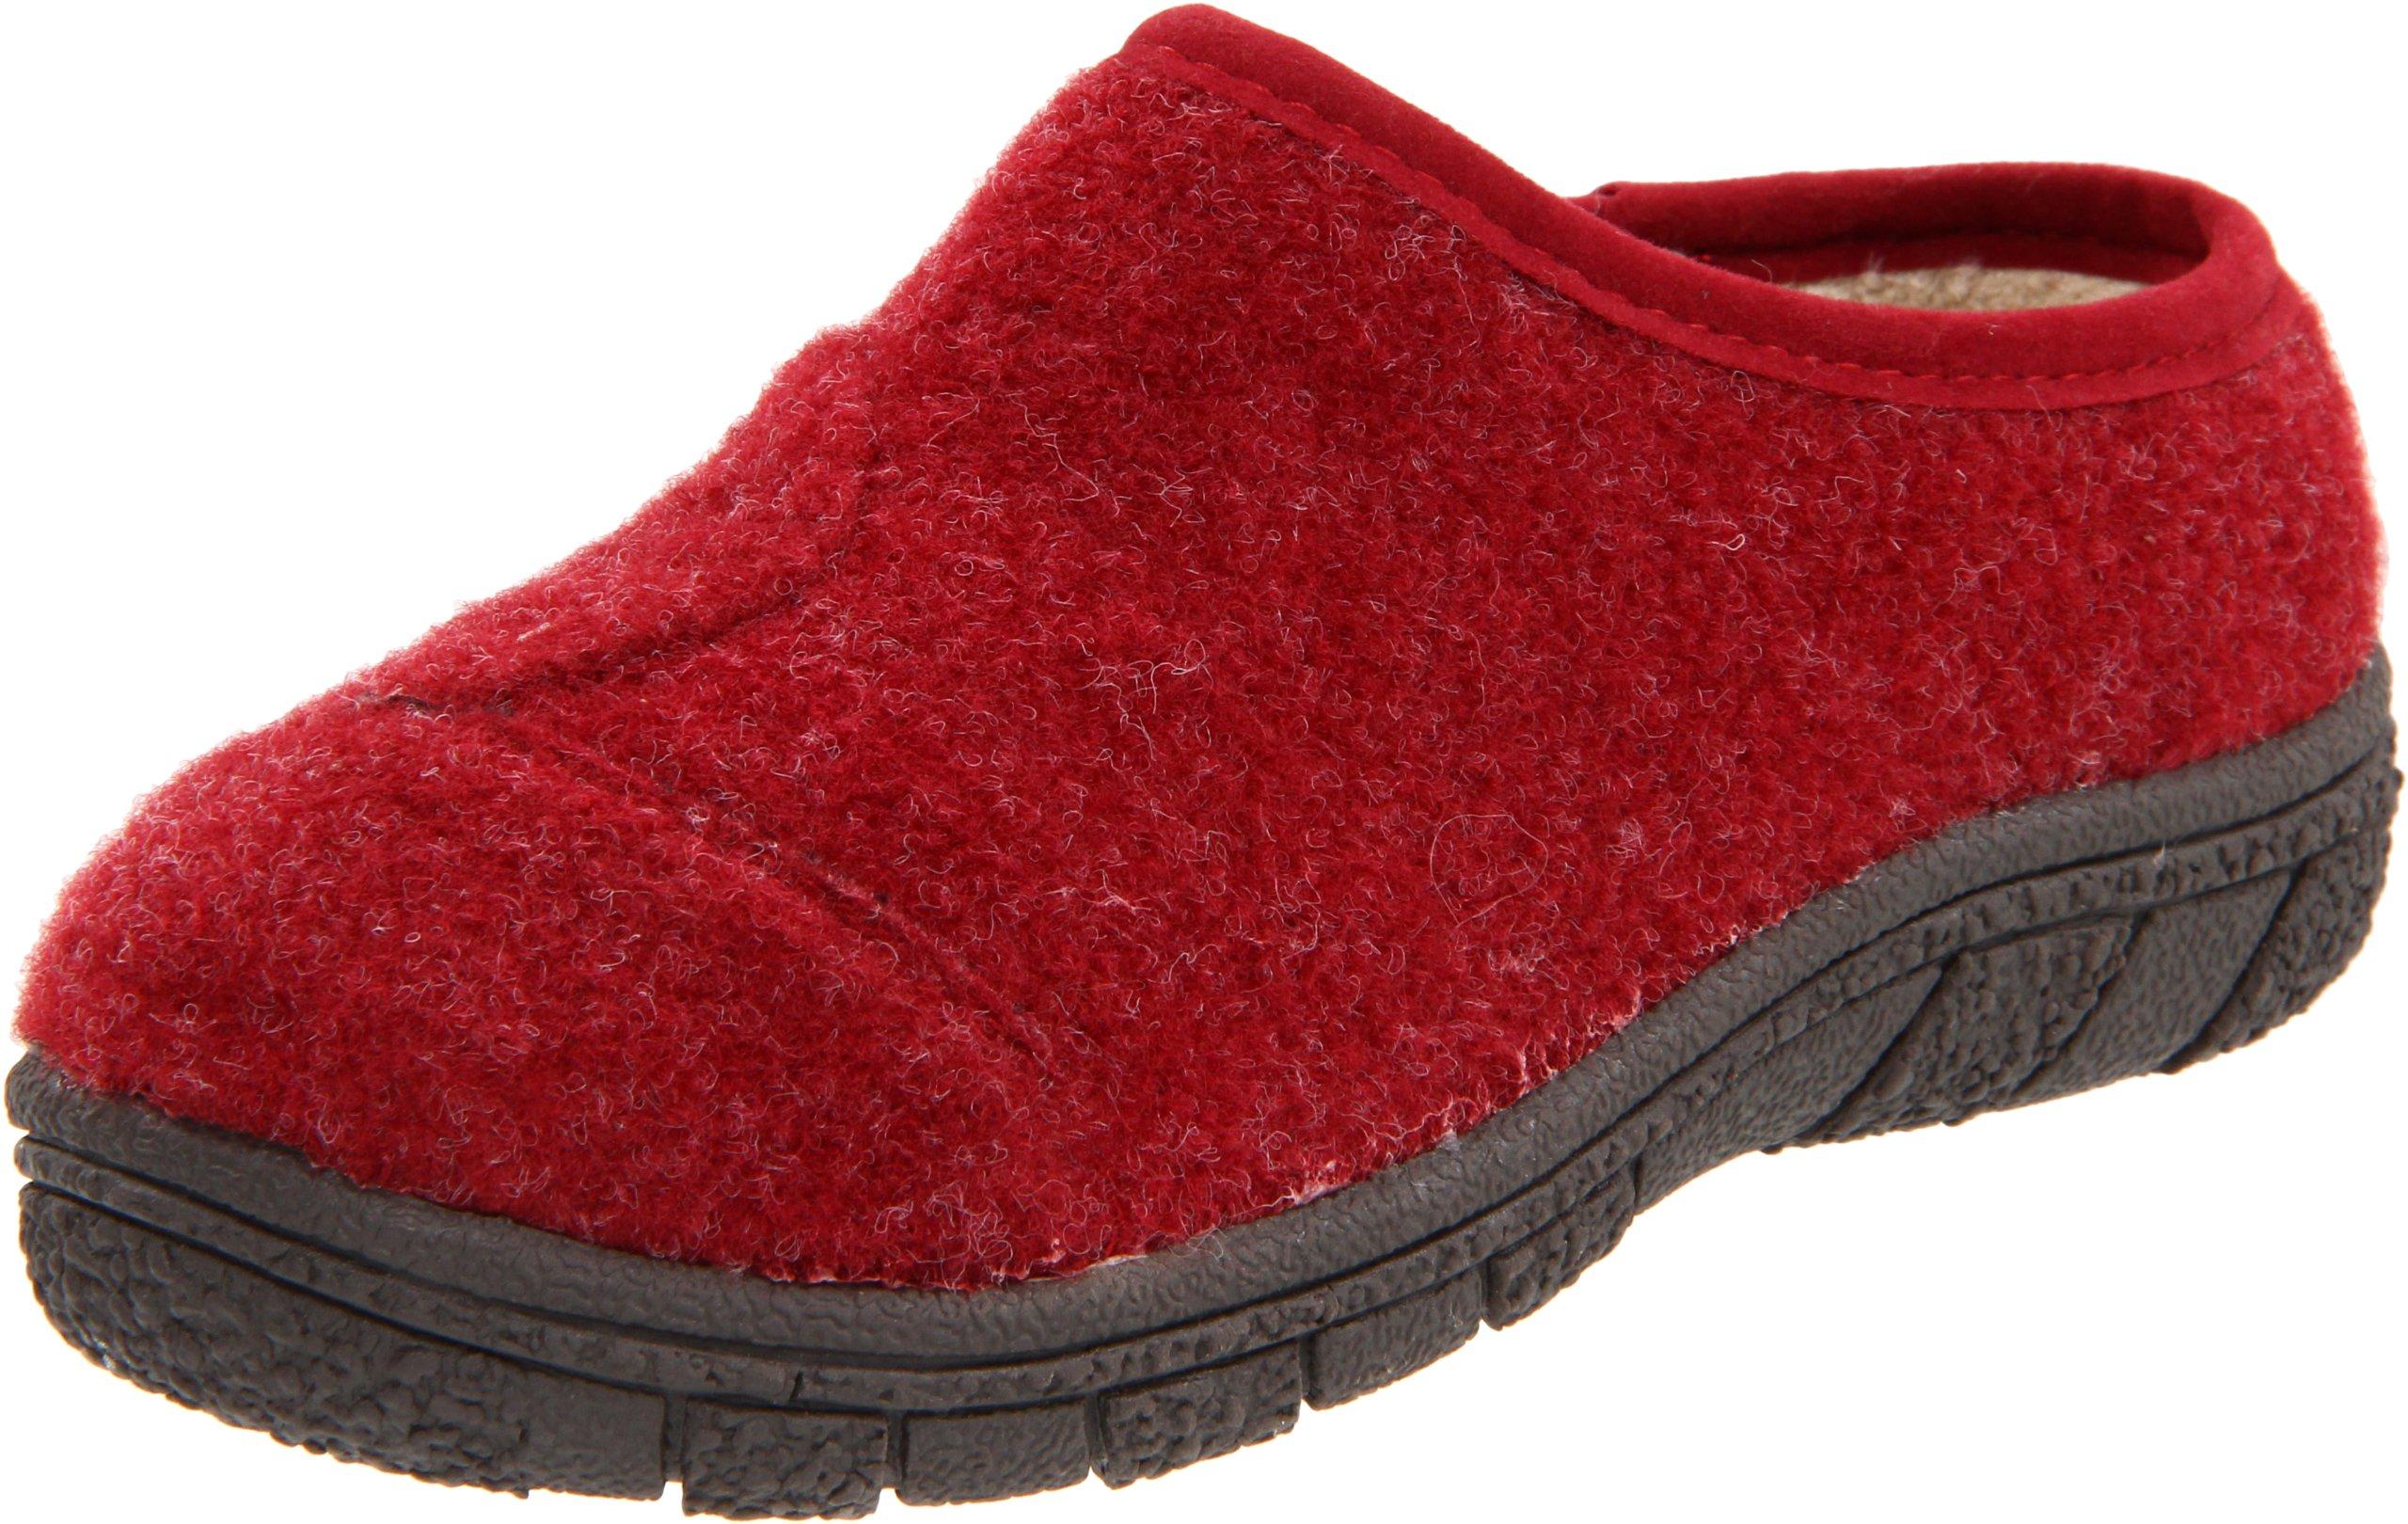 Willits Tidal Clog (Toddler/Little Kid/Big Kid),Cranberry Boiled Wool,2 M US Little Kid